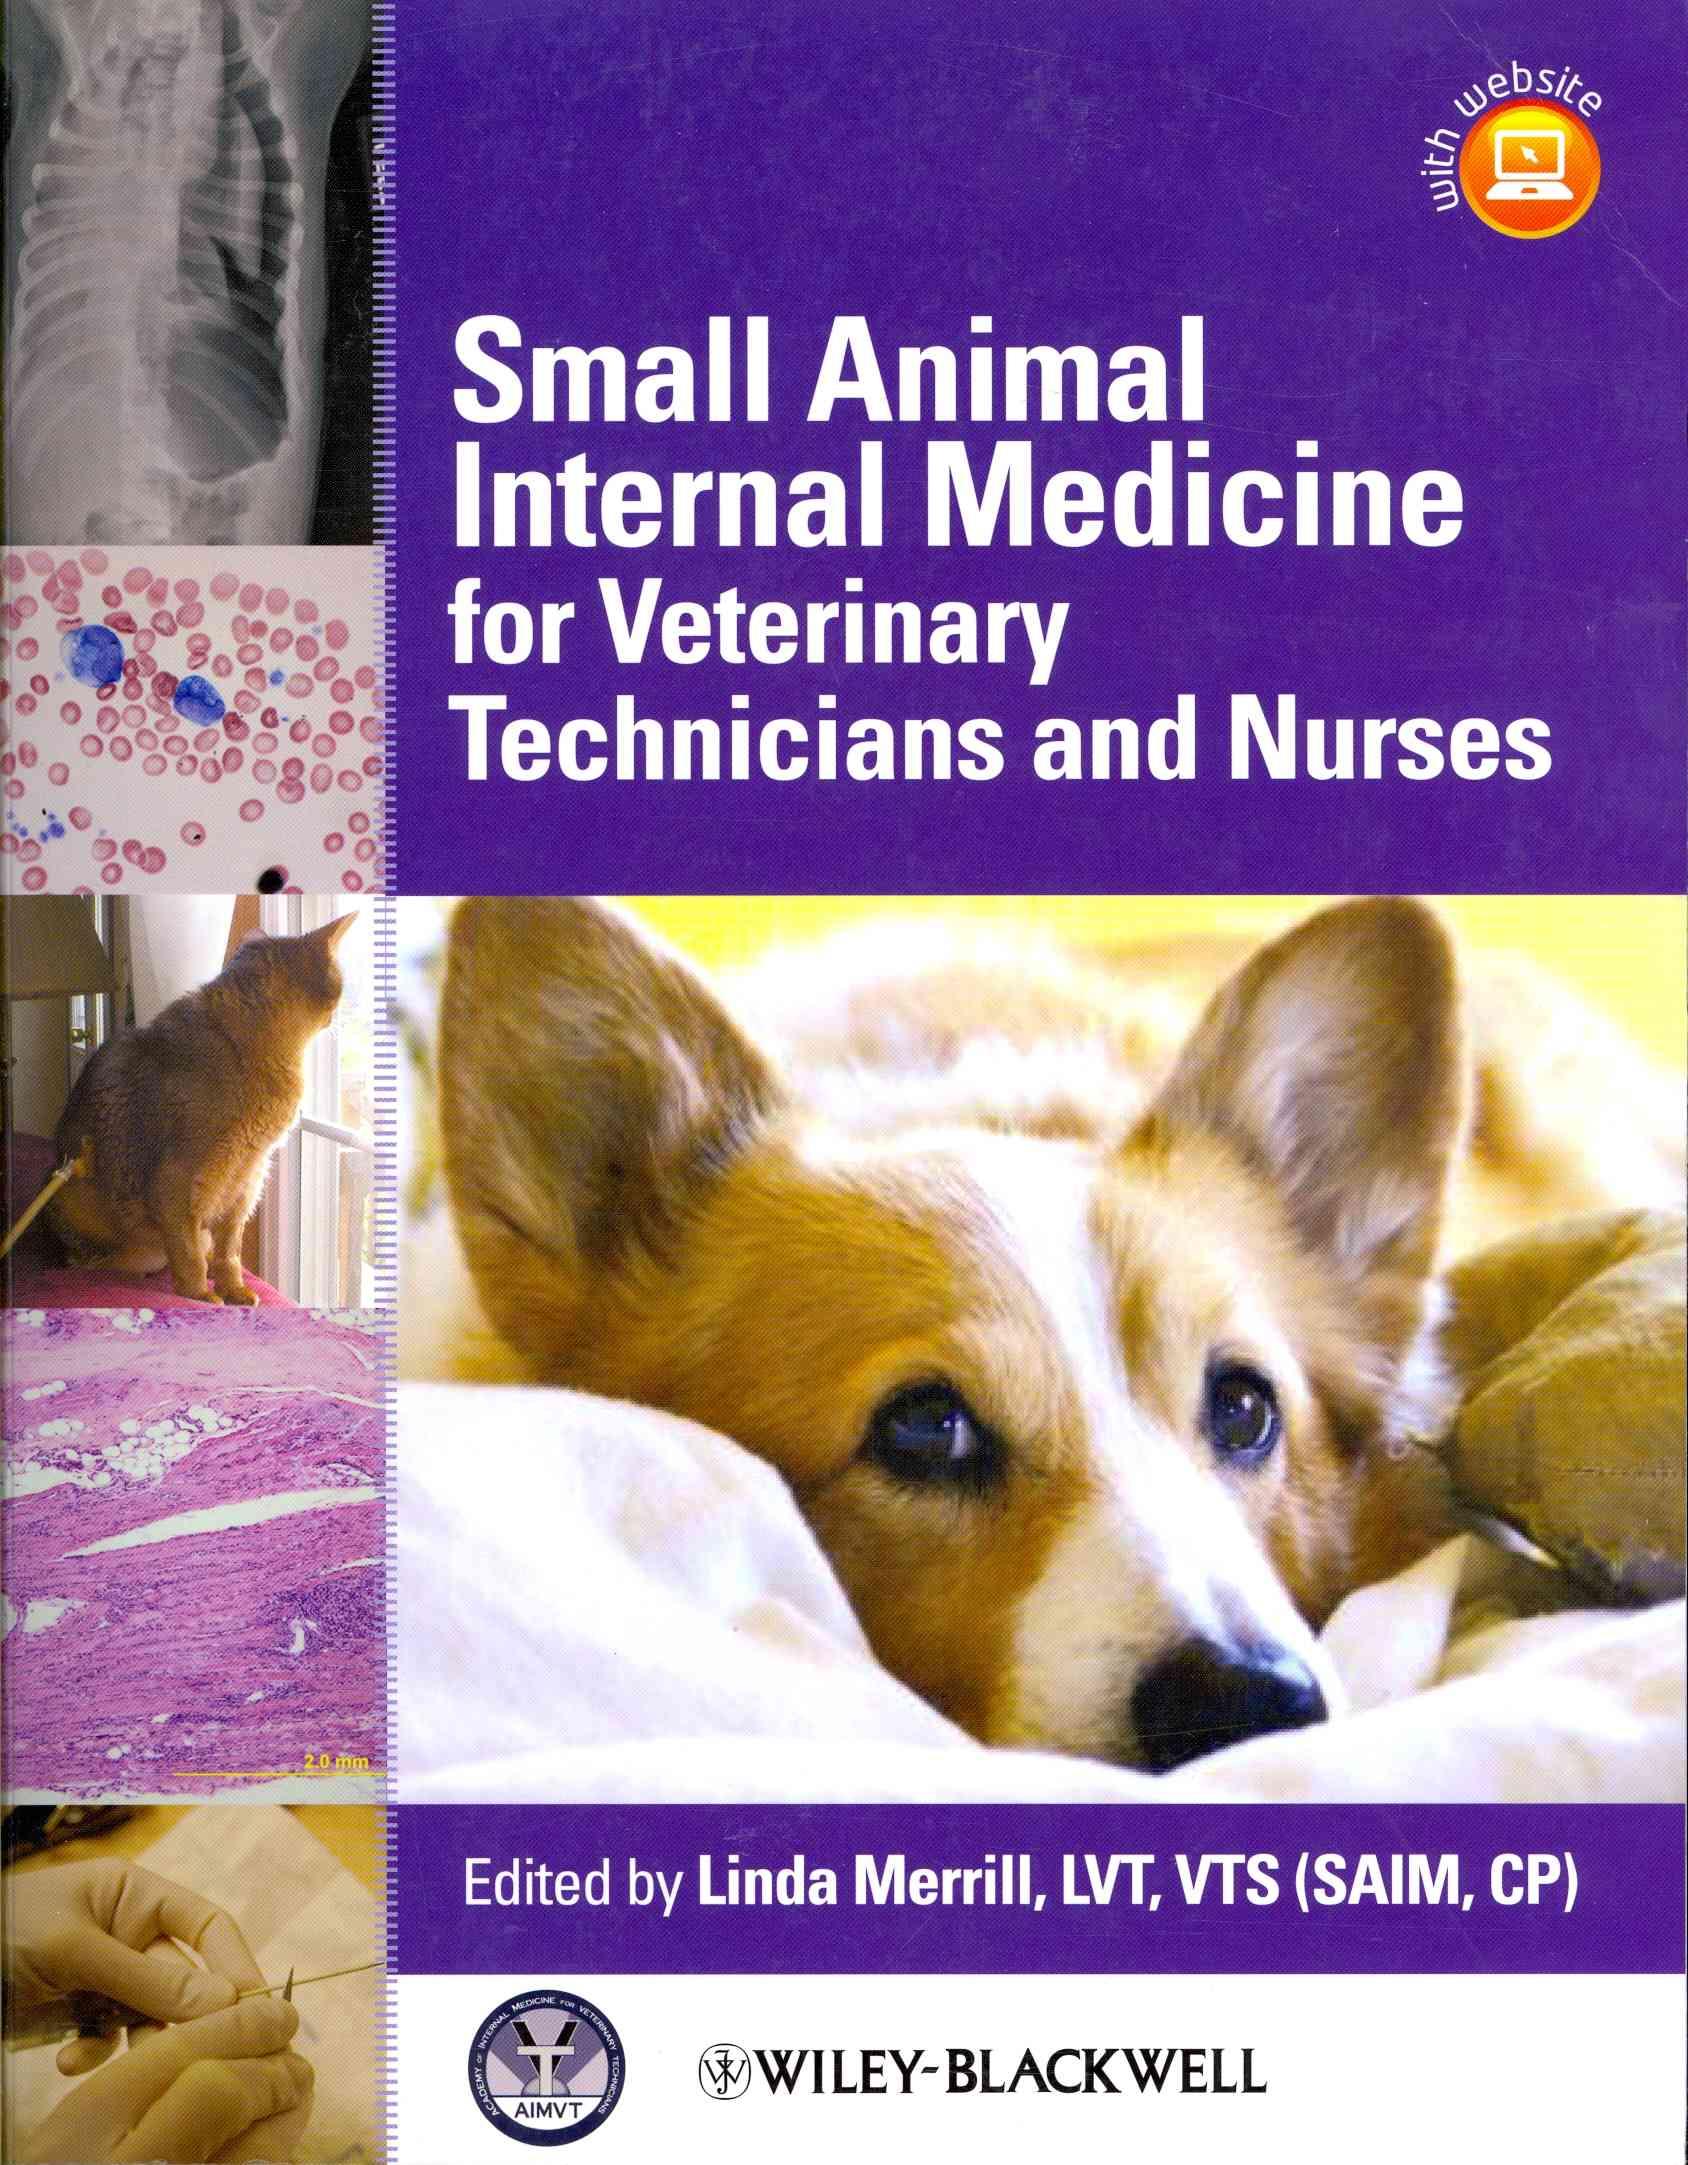 Small Animal Internal Medicine for Veterinary Technicians and Nurses By Merrill, Linda (EDT)